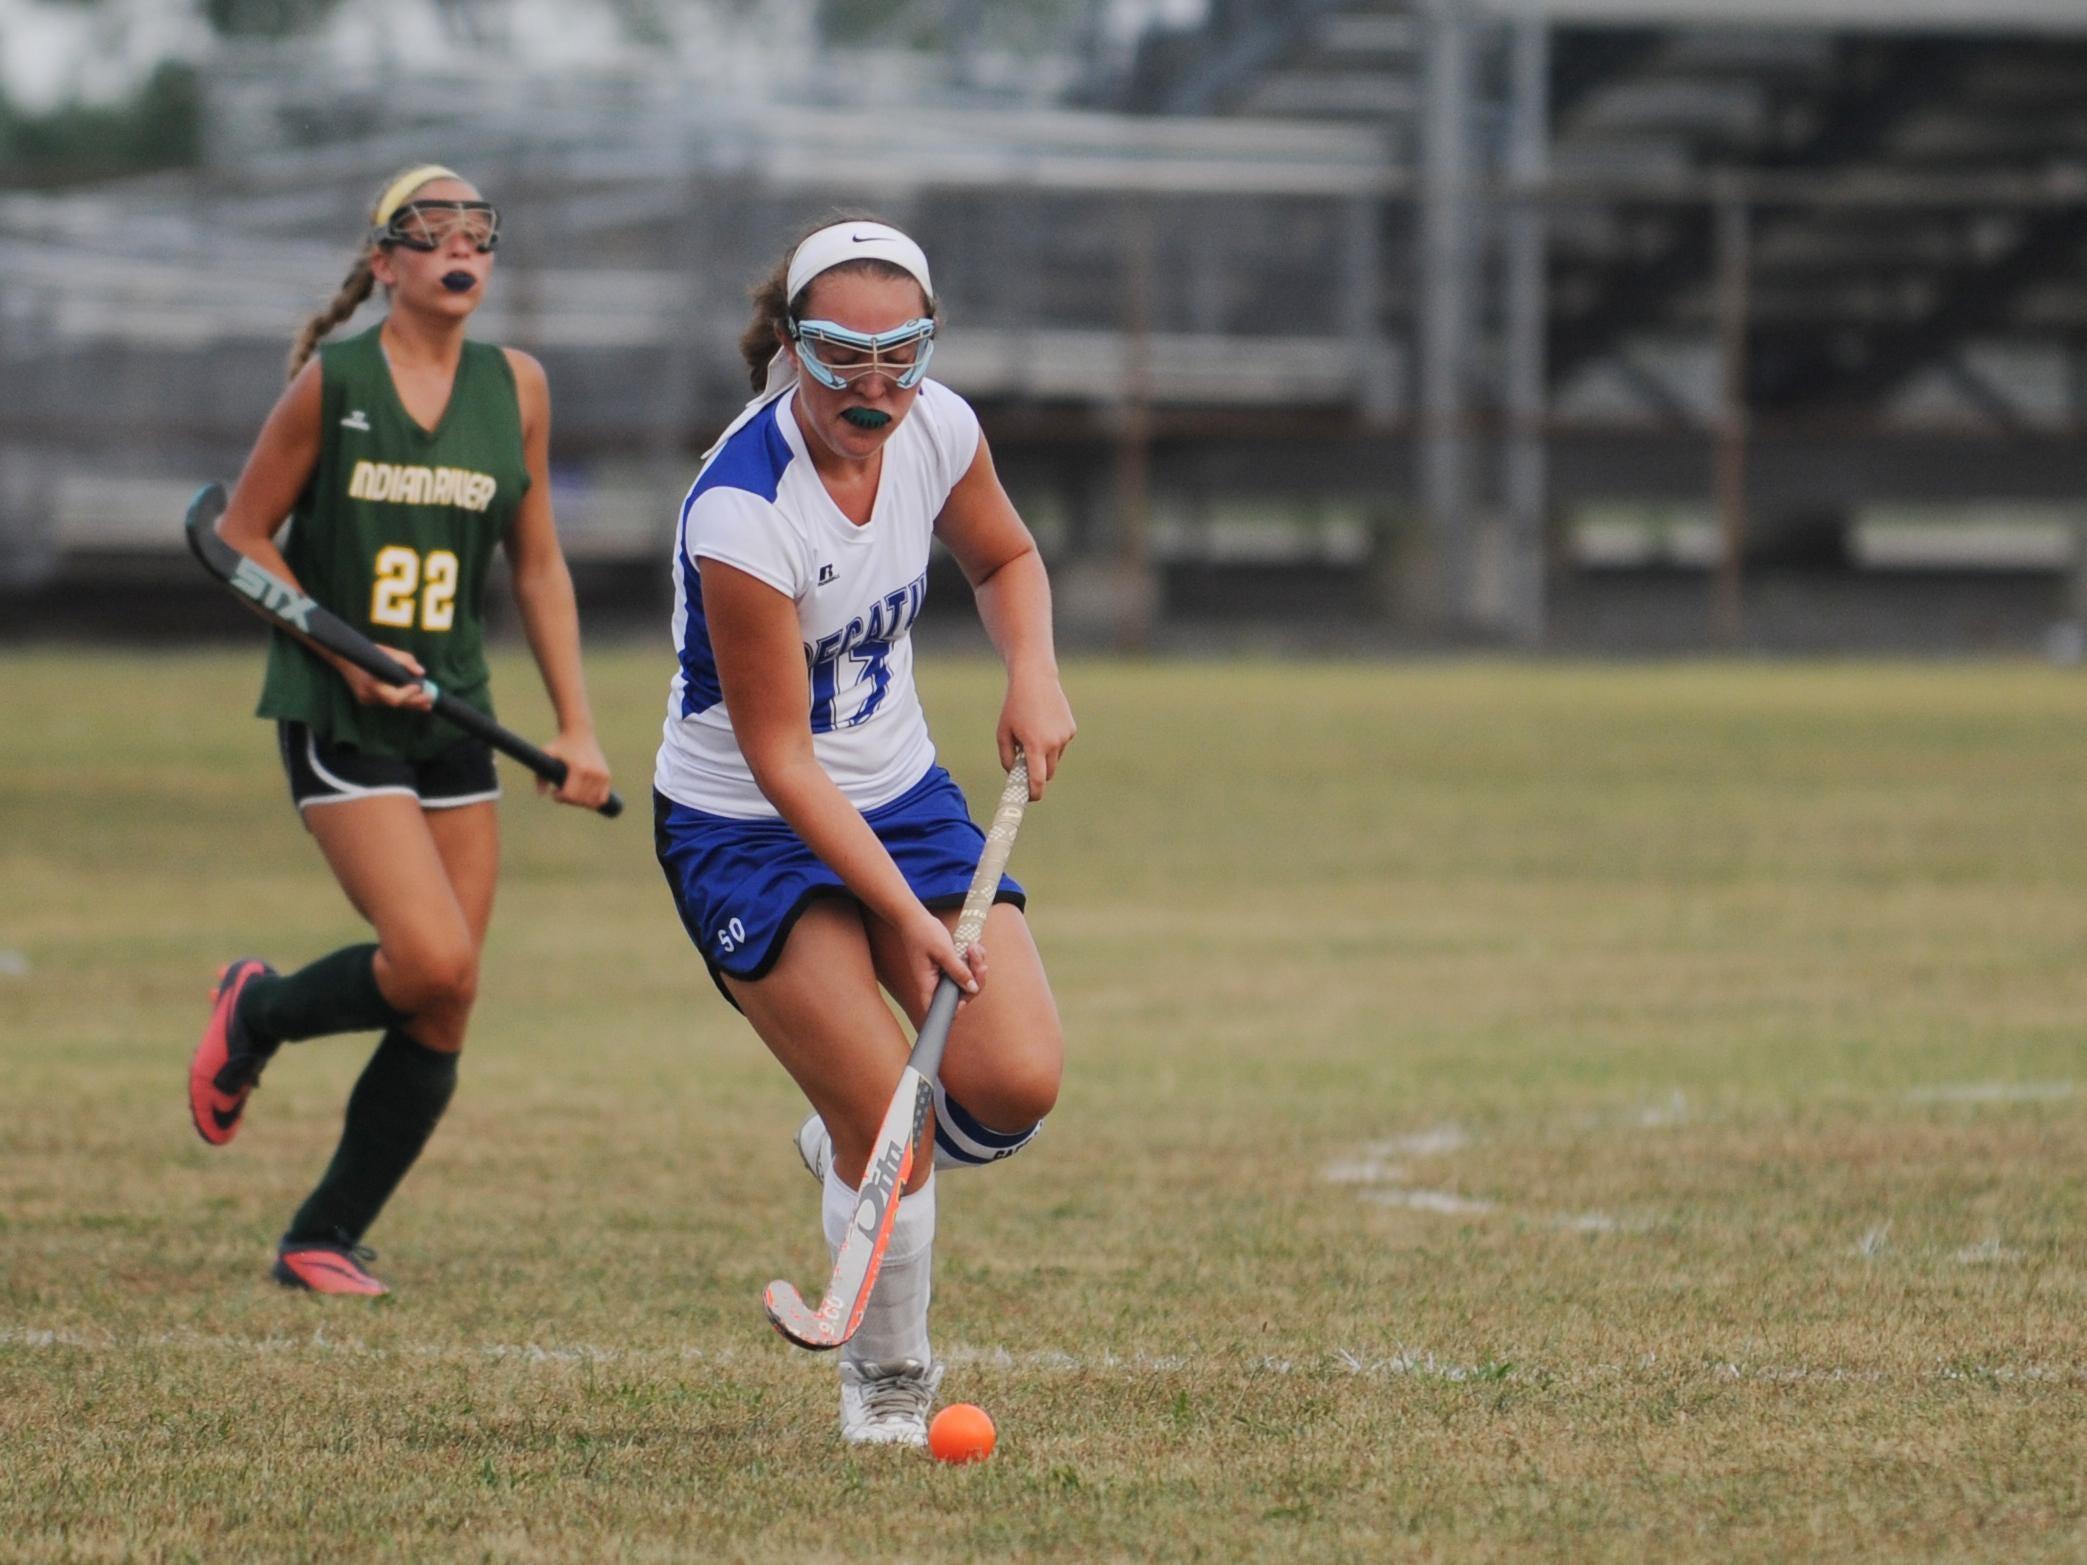 Stephen Decatur midfielder Sara Mitrecic works the ball up field against Indian River.